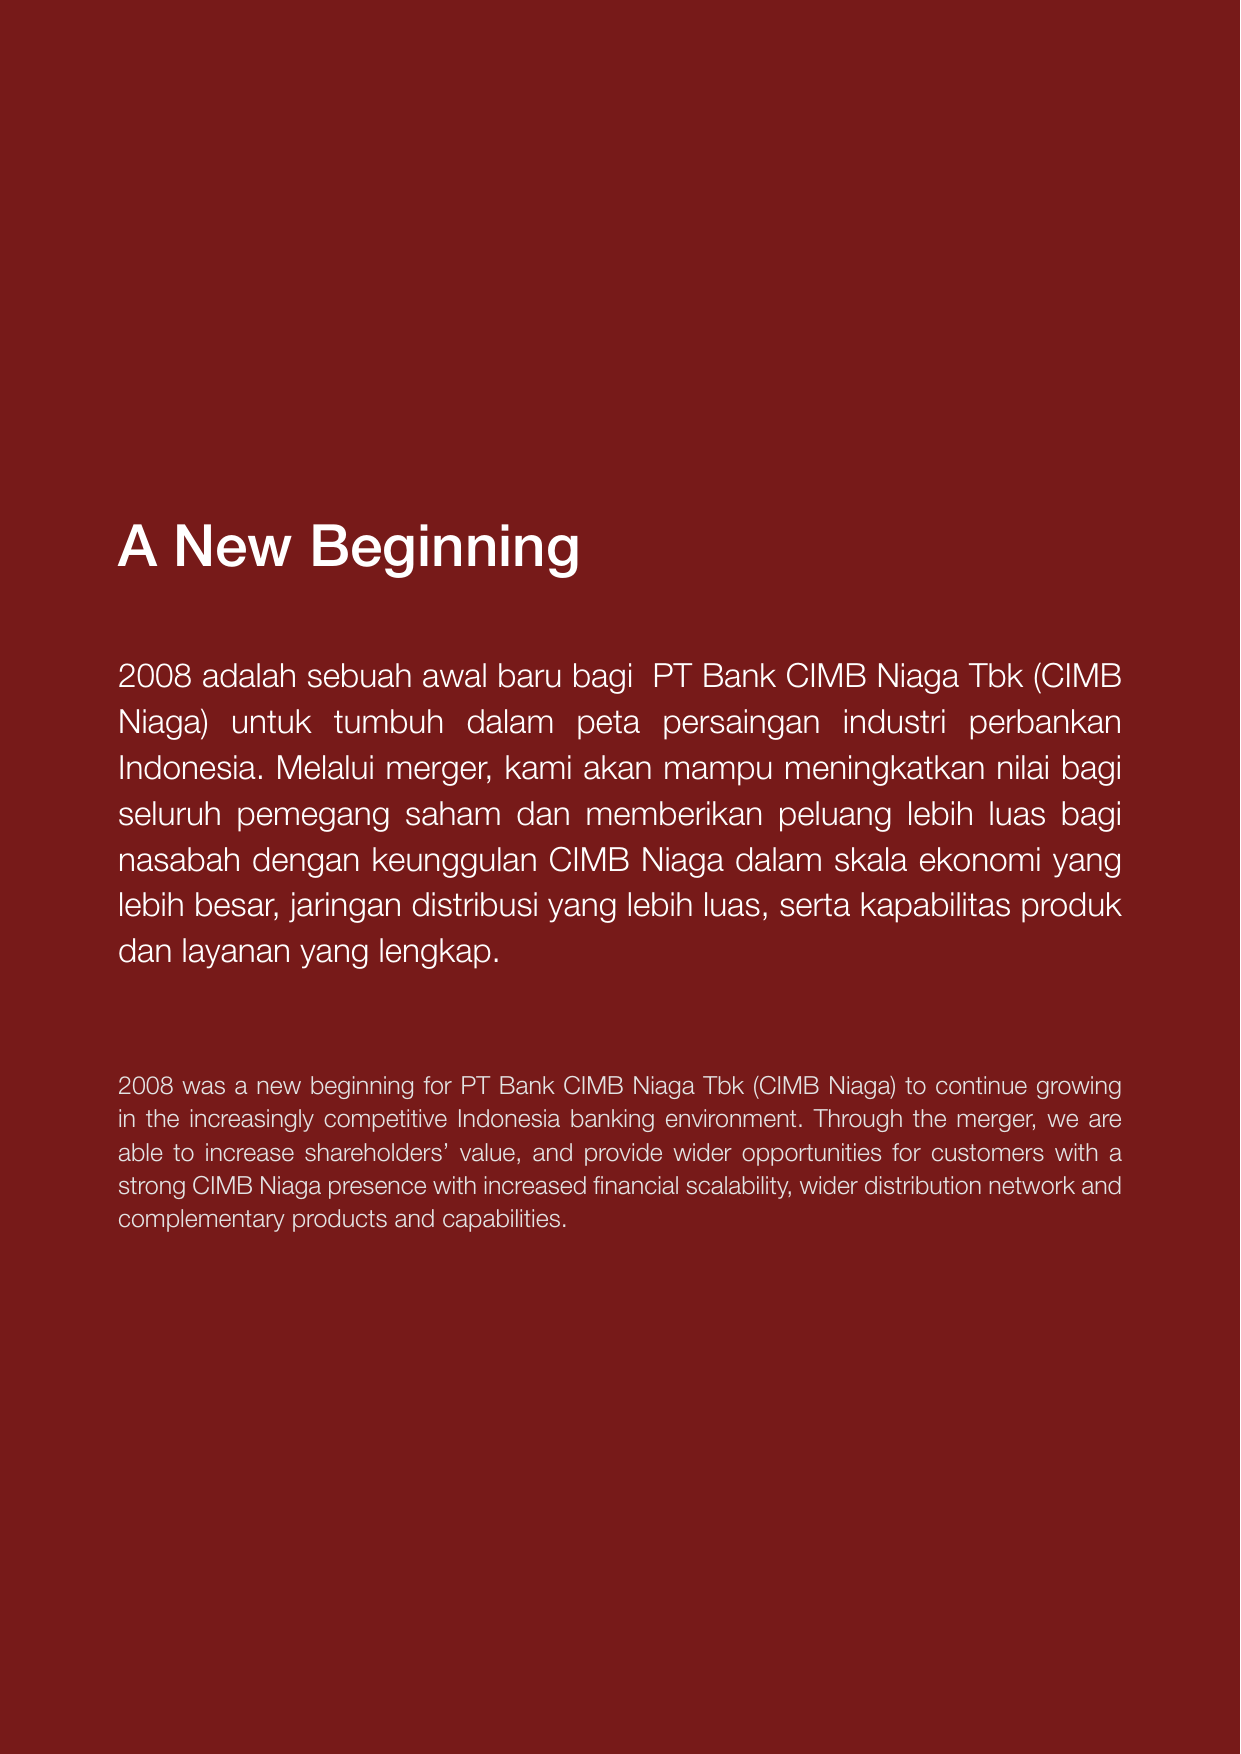 A New Beginning Bank Cimb Niaga